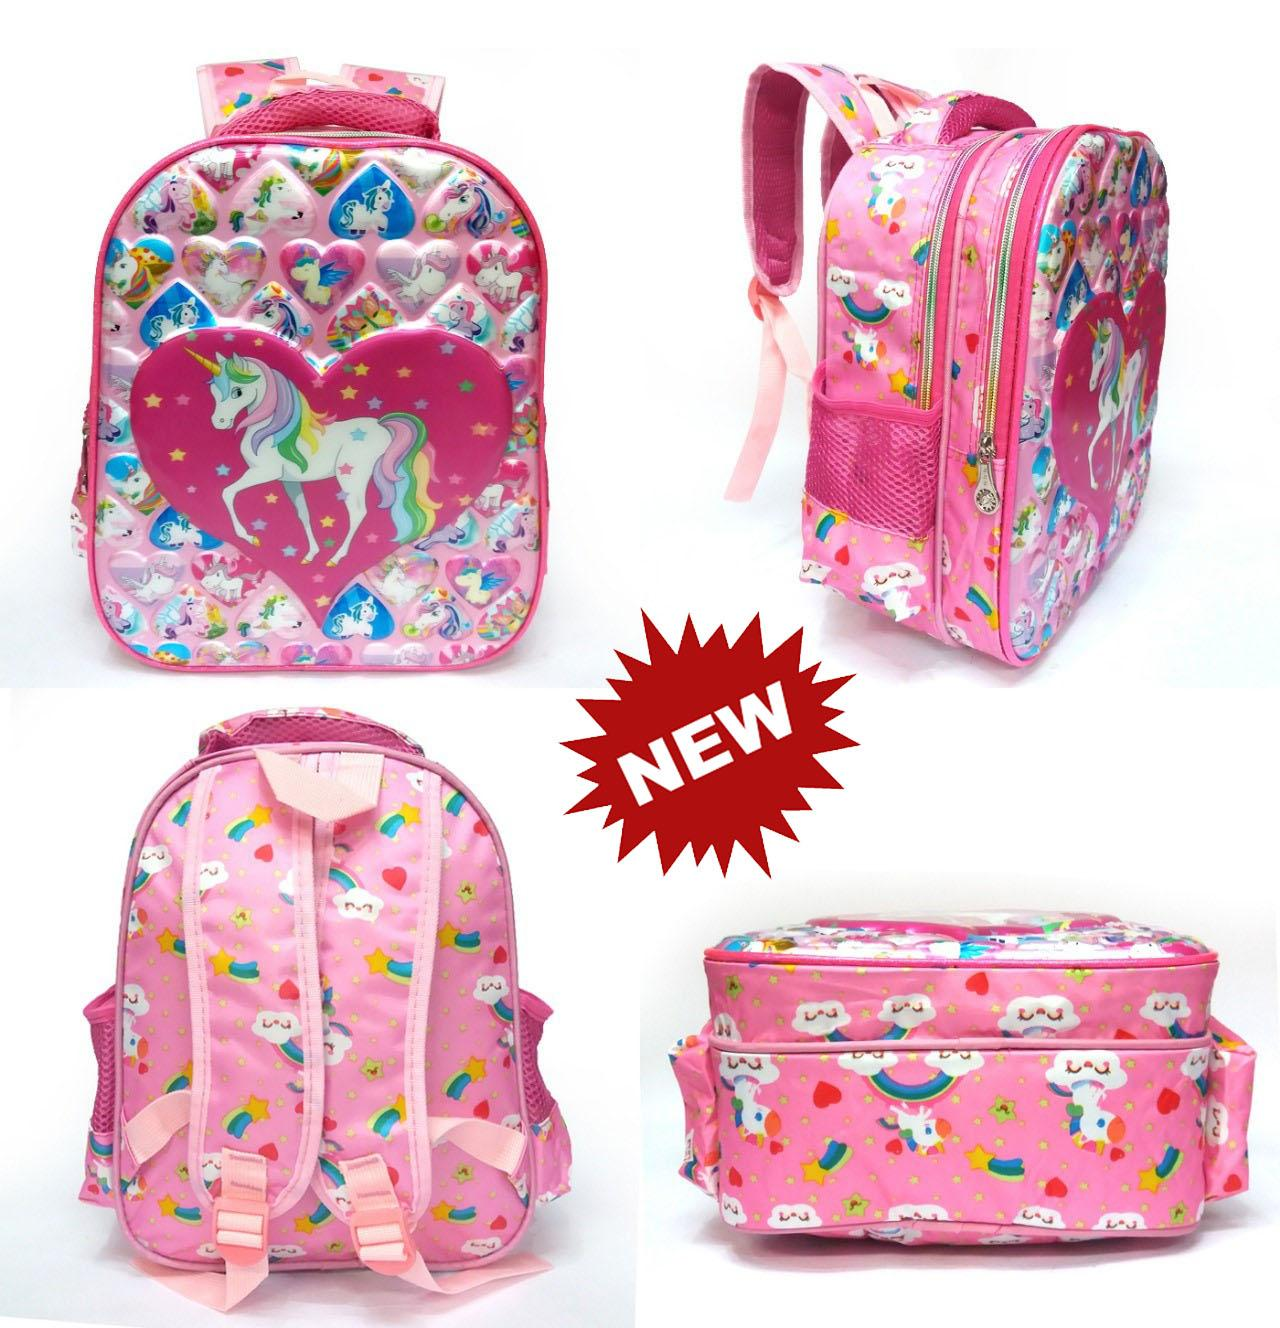 Onlan Ransel TERBAIK TERMURAH Tas Ransel Anak Sekolah TK - Little Pony - Frozen - LOL